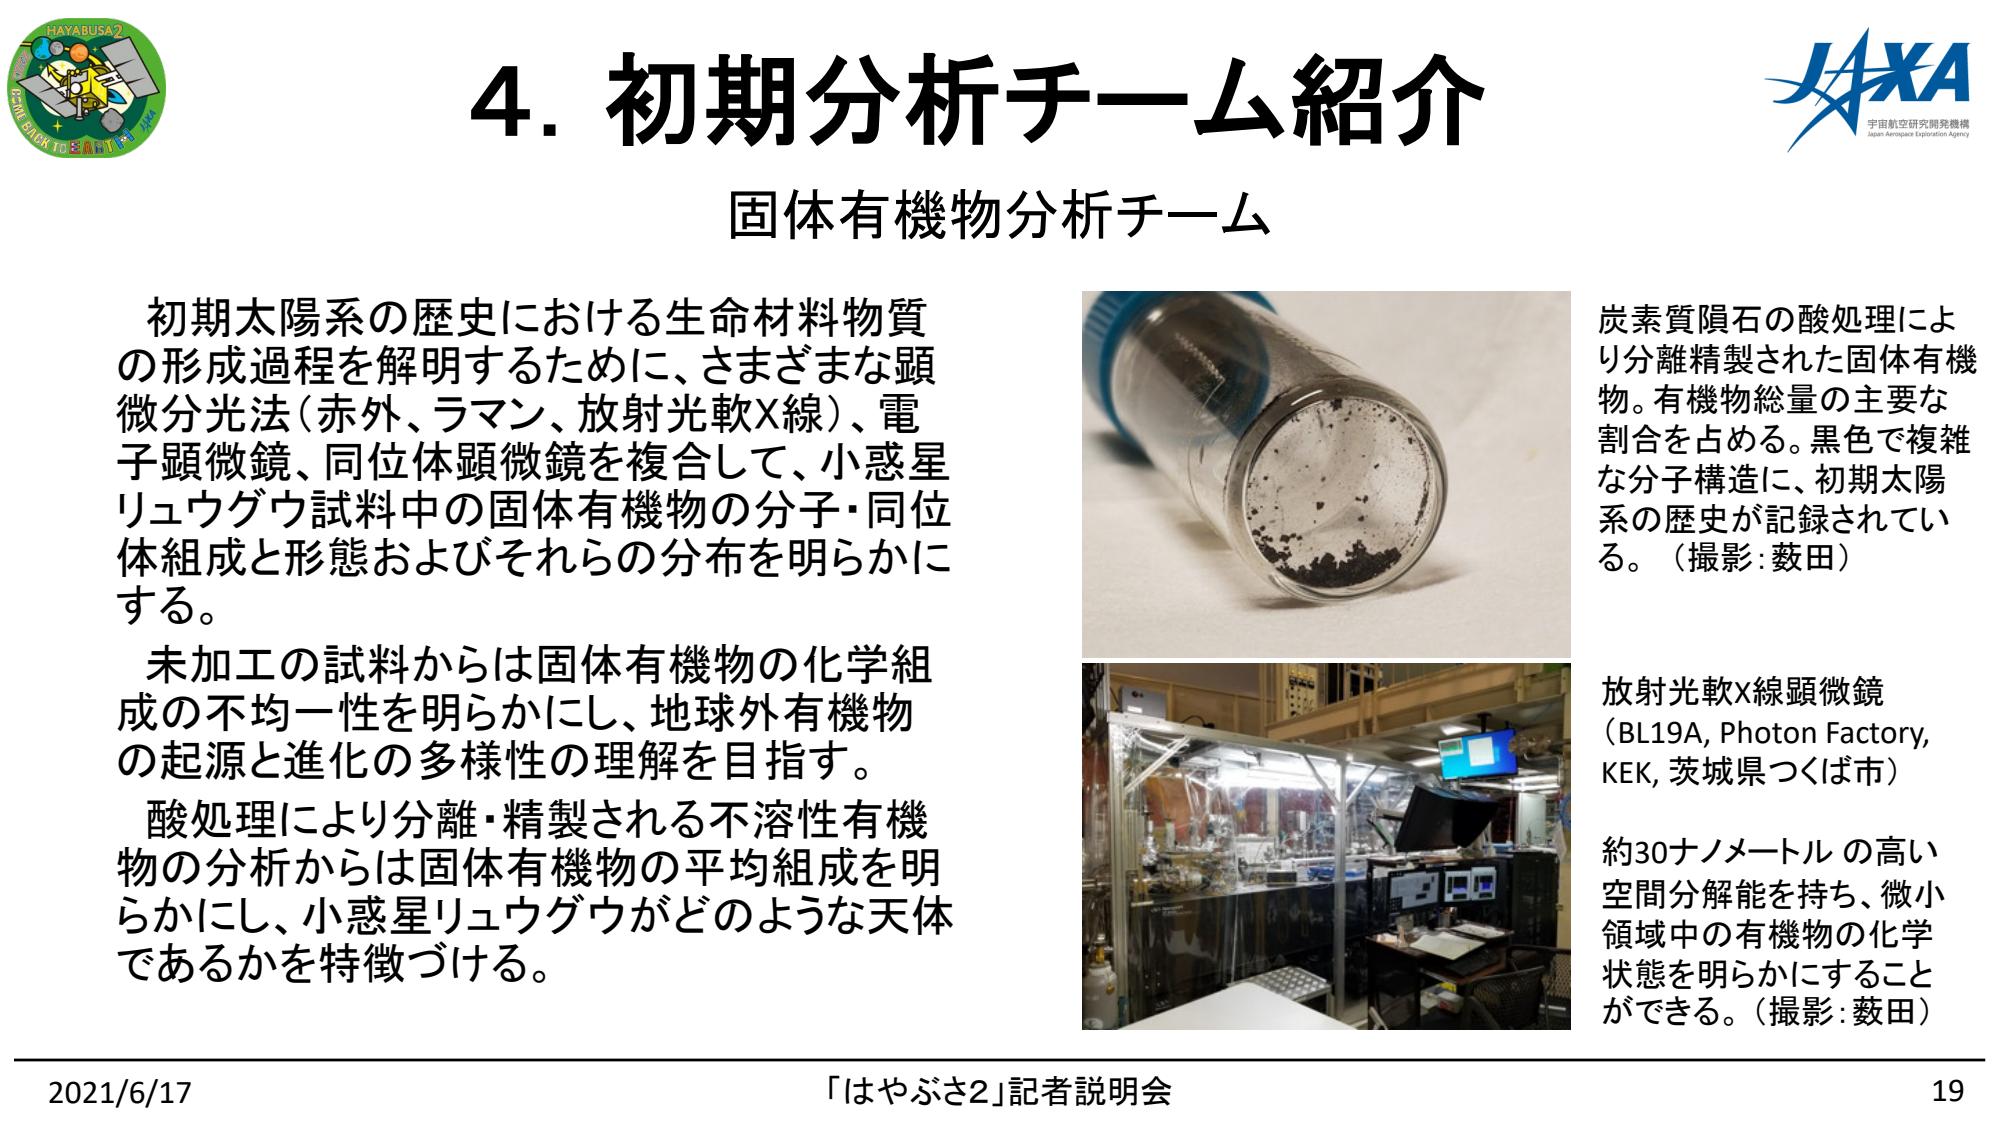 f:id:Imamura:20210617130318p:plain